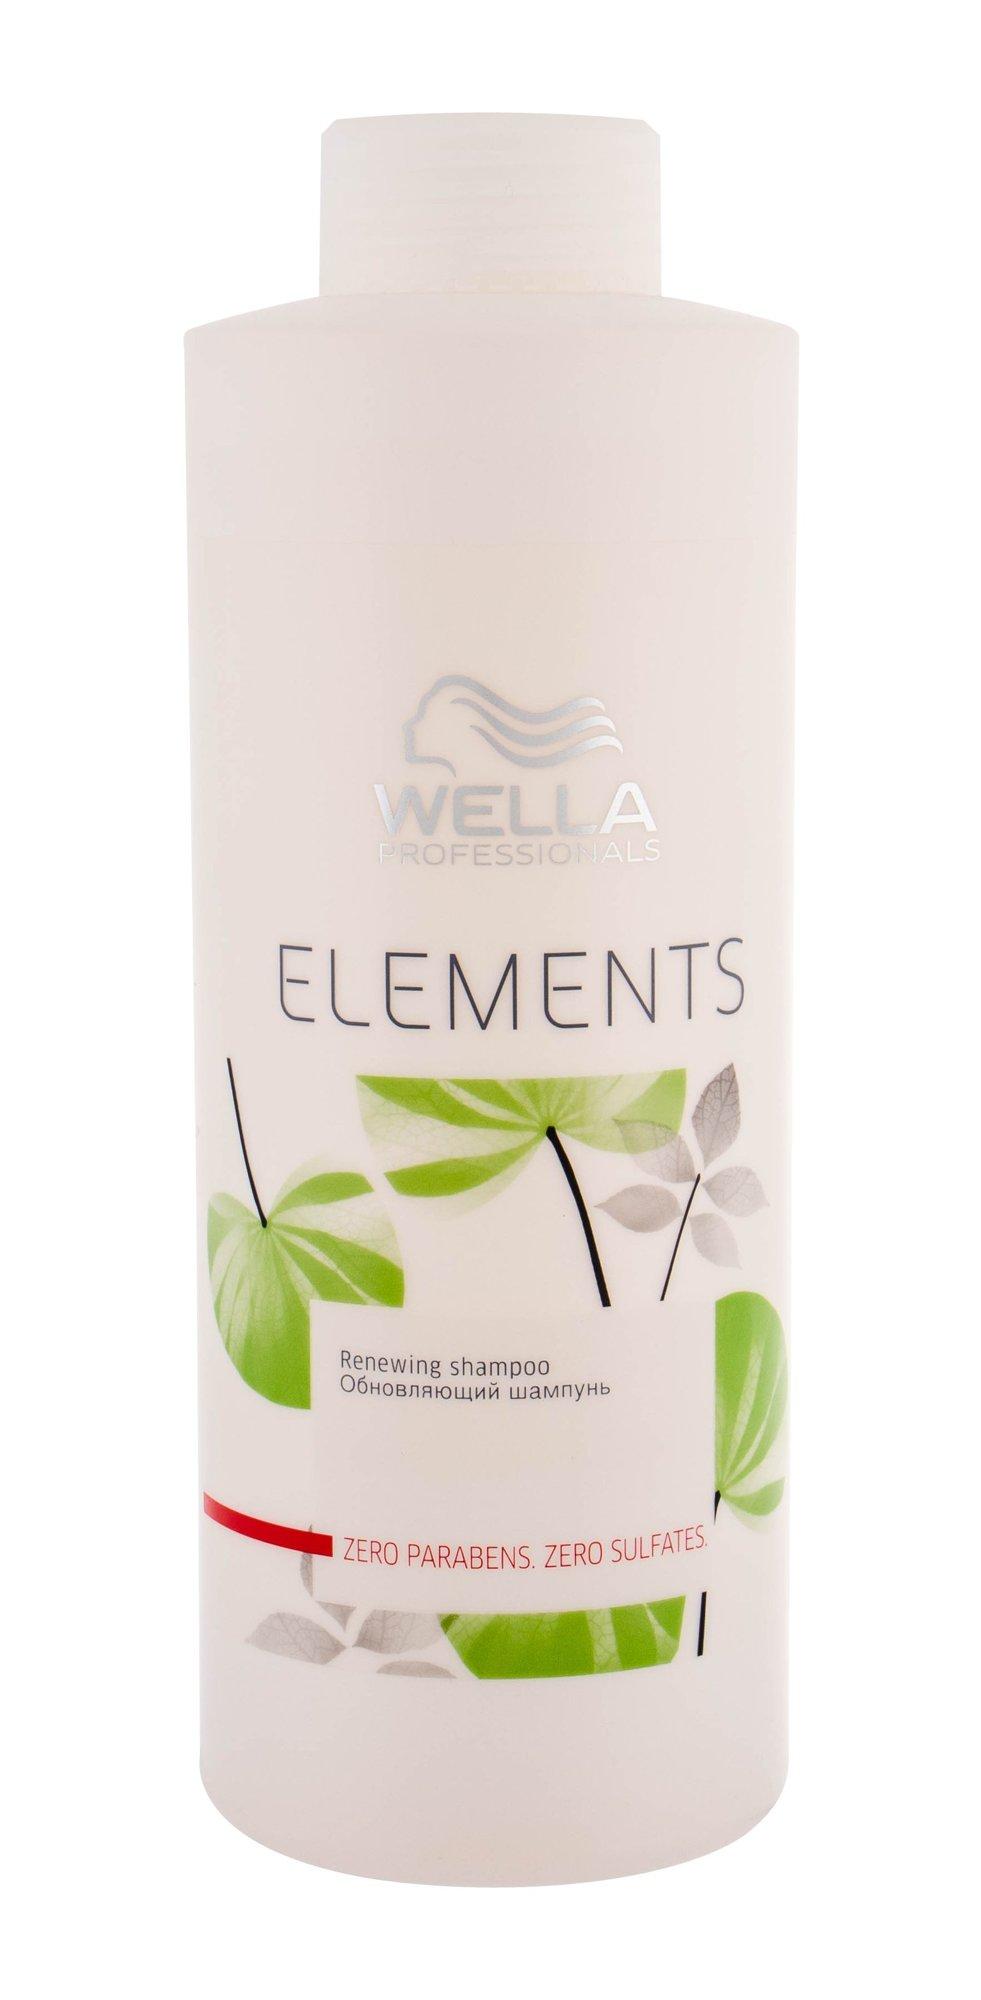 Wella Elements Shampoo 1000ml